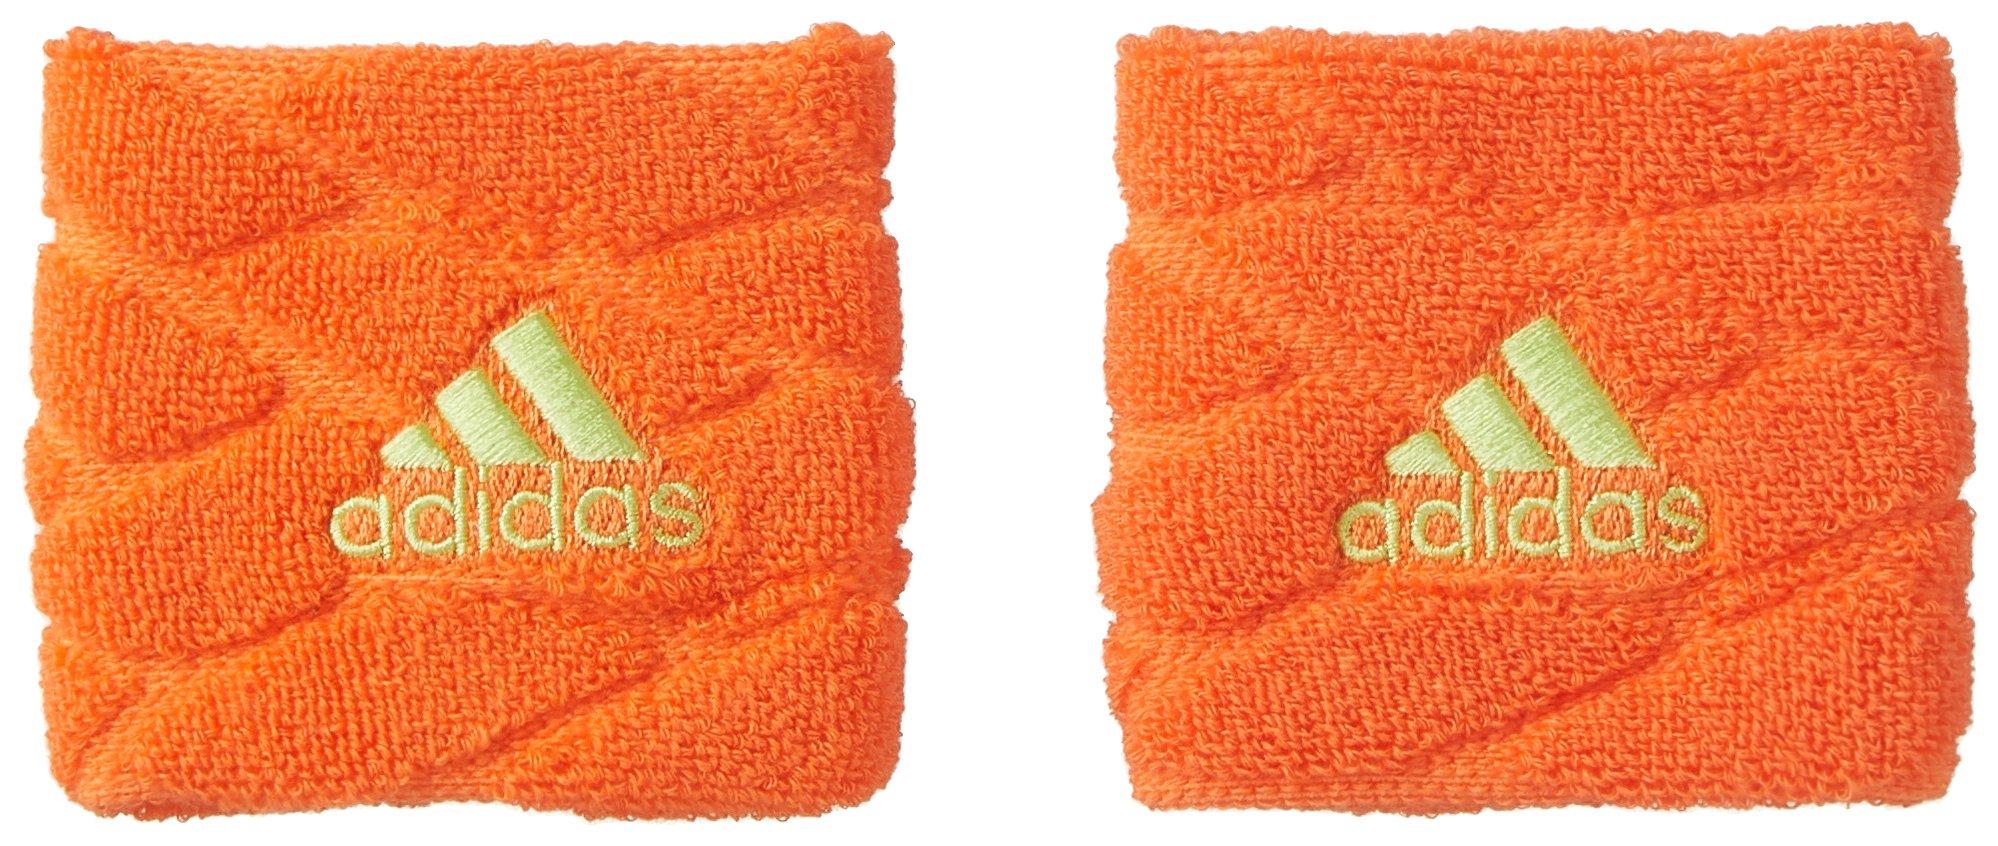 Adidas Unisex Men Women Tennis Braided Wristband Small Fitness Game CF6932